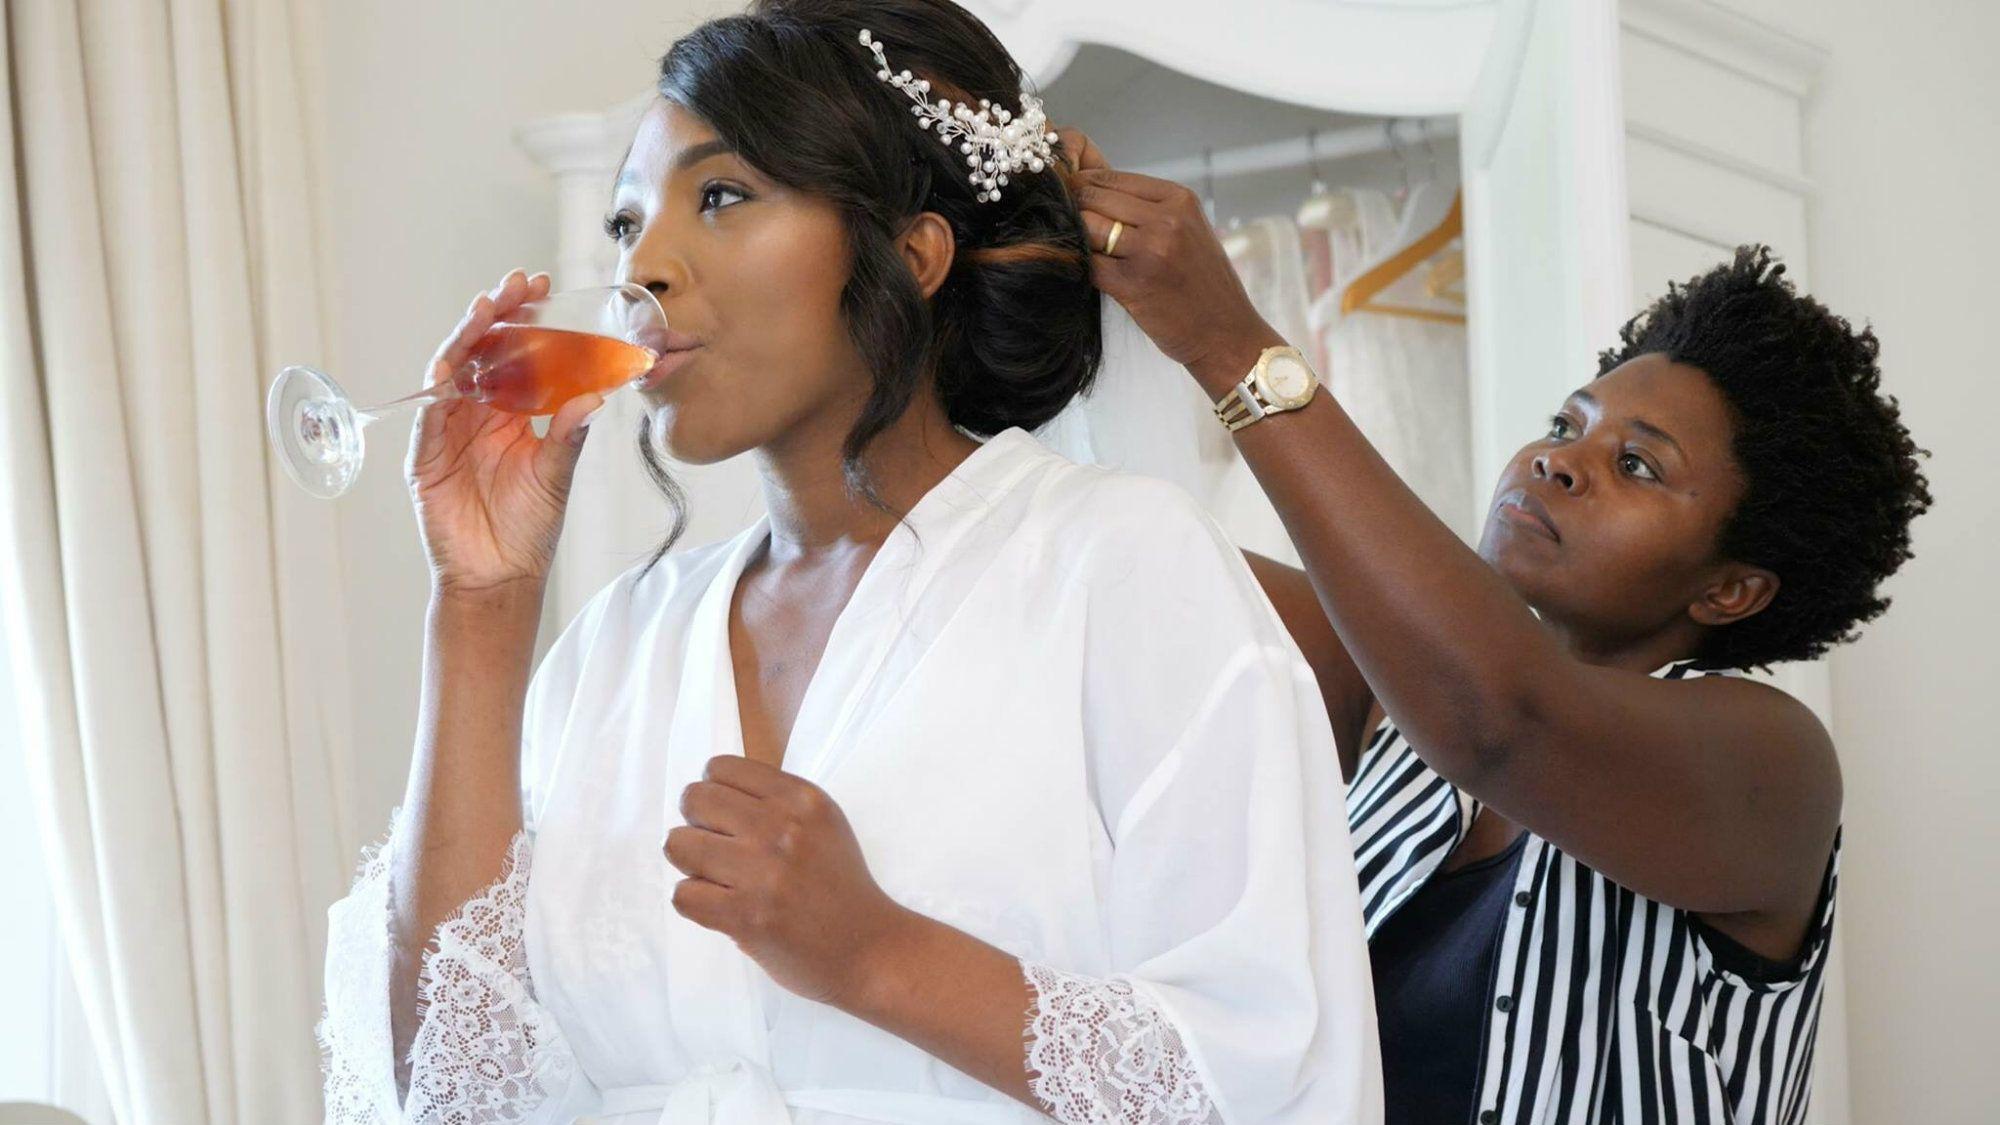 Cheltenham bridal hair stylist-Manor by the lake-UK-LVN-IMG_4996